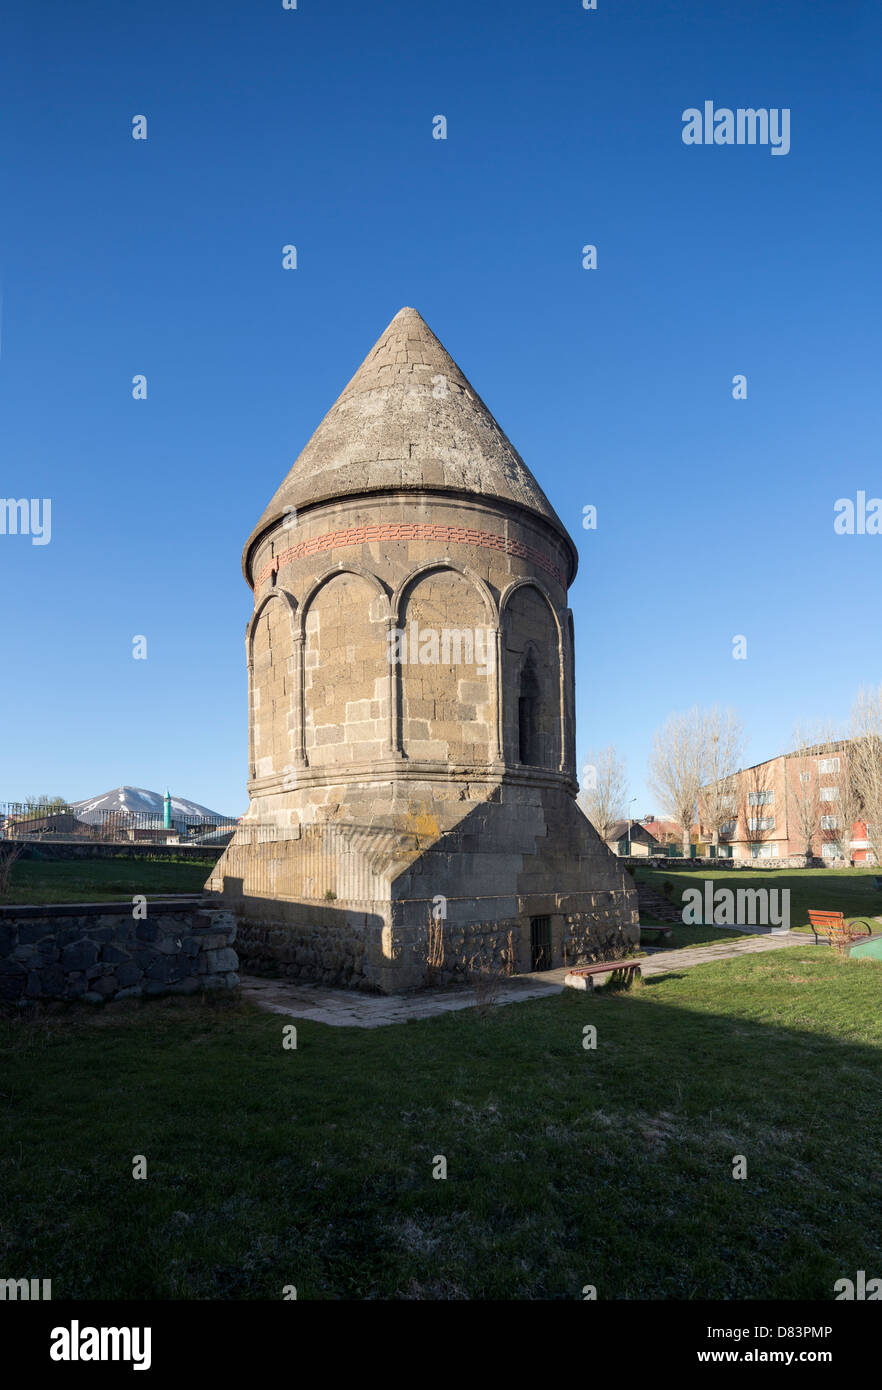 Tombeau seldjoukide anonyme tower, Erzeroum, Turquie Photo Stock